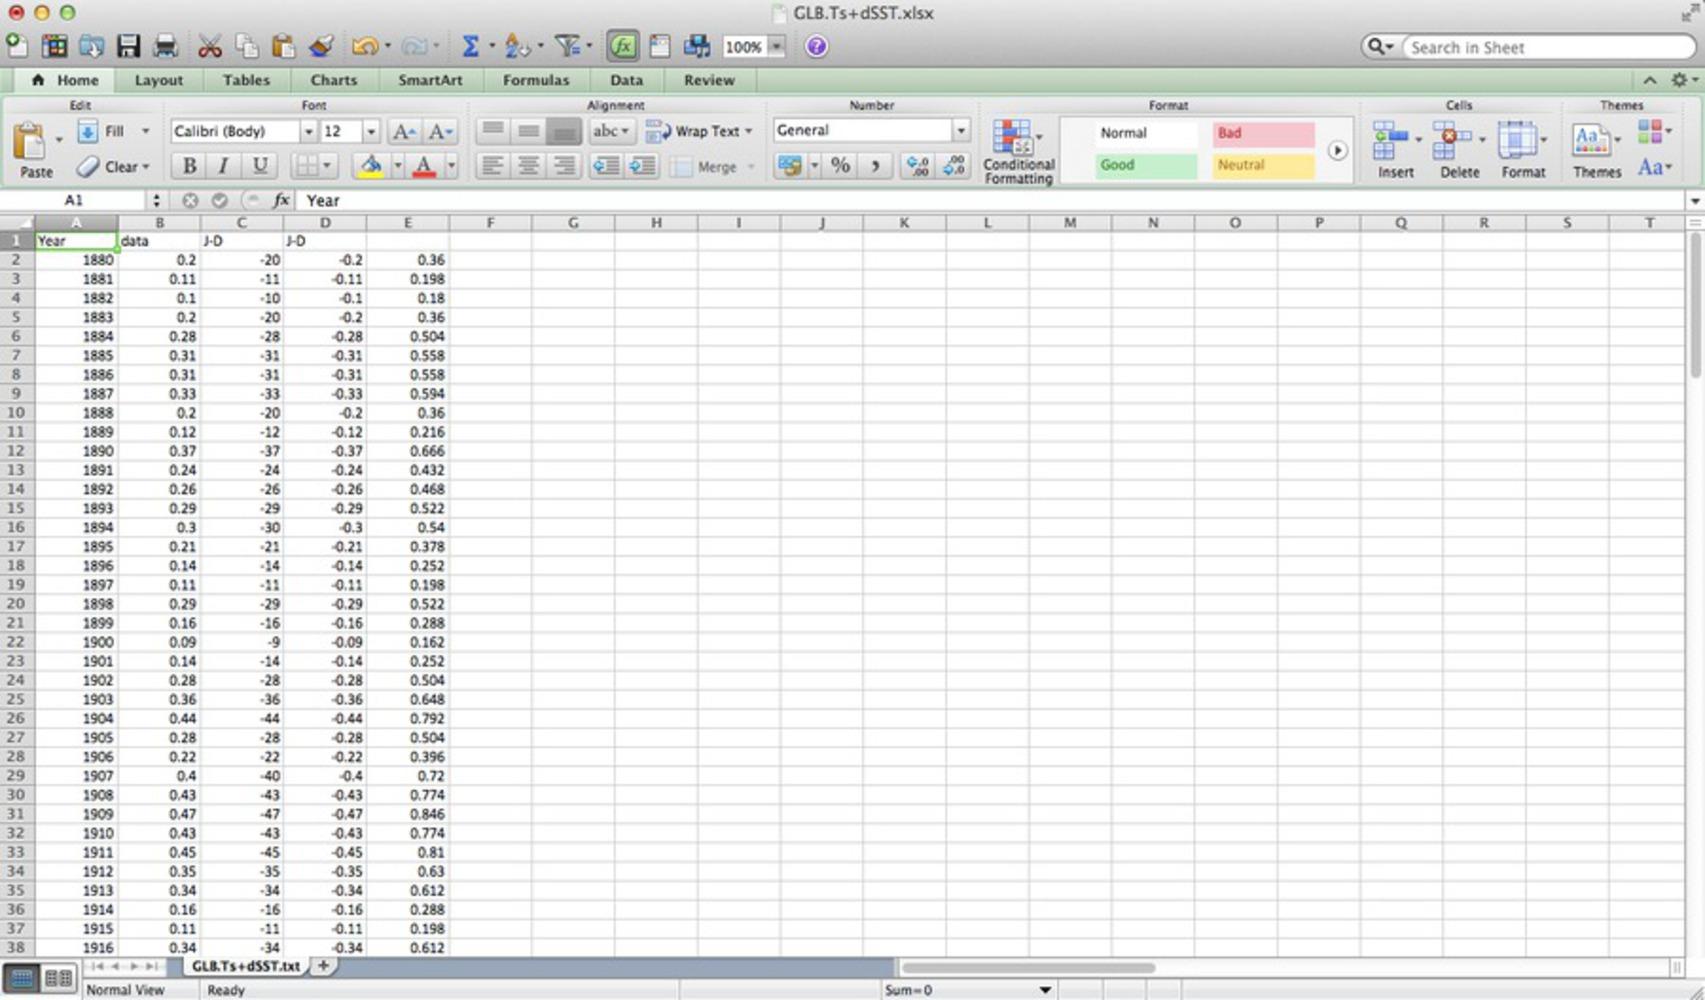 Data.thumb